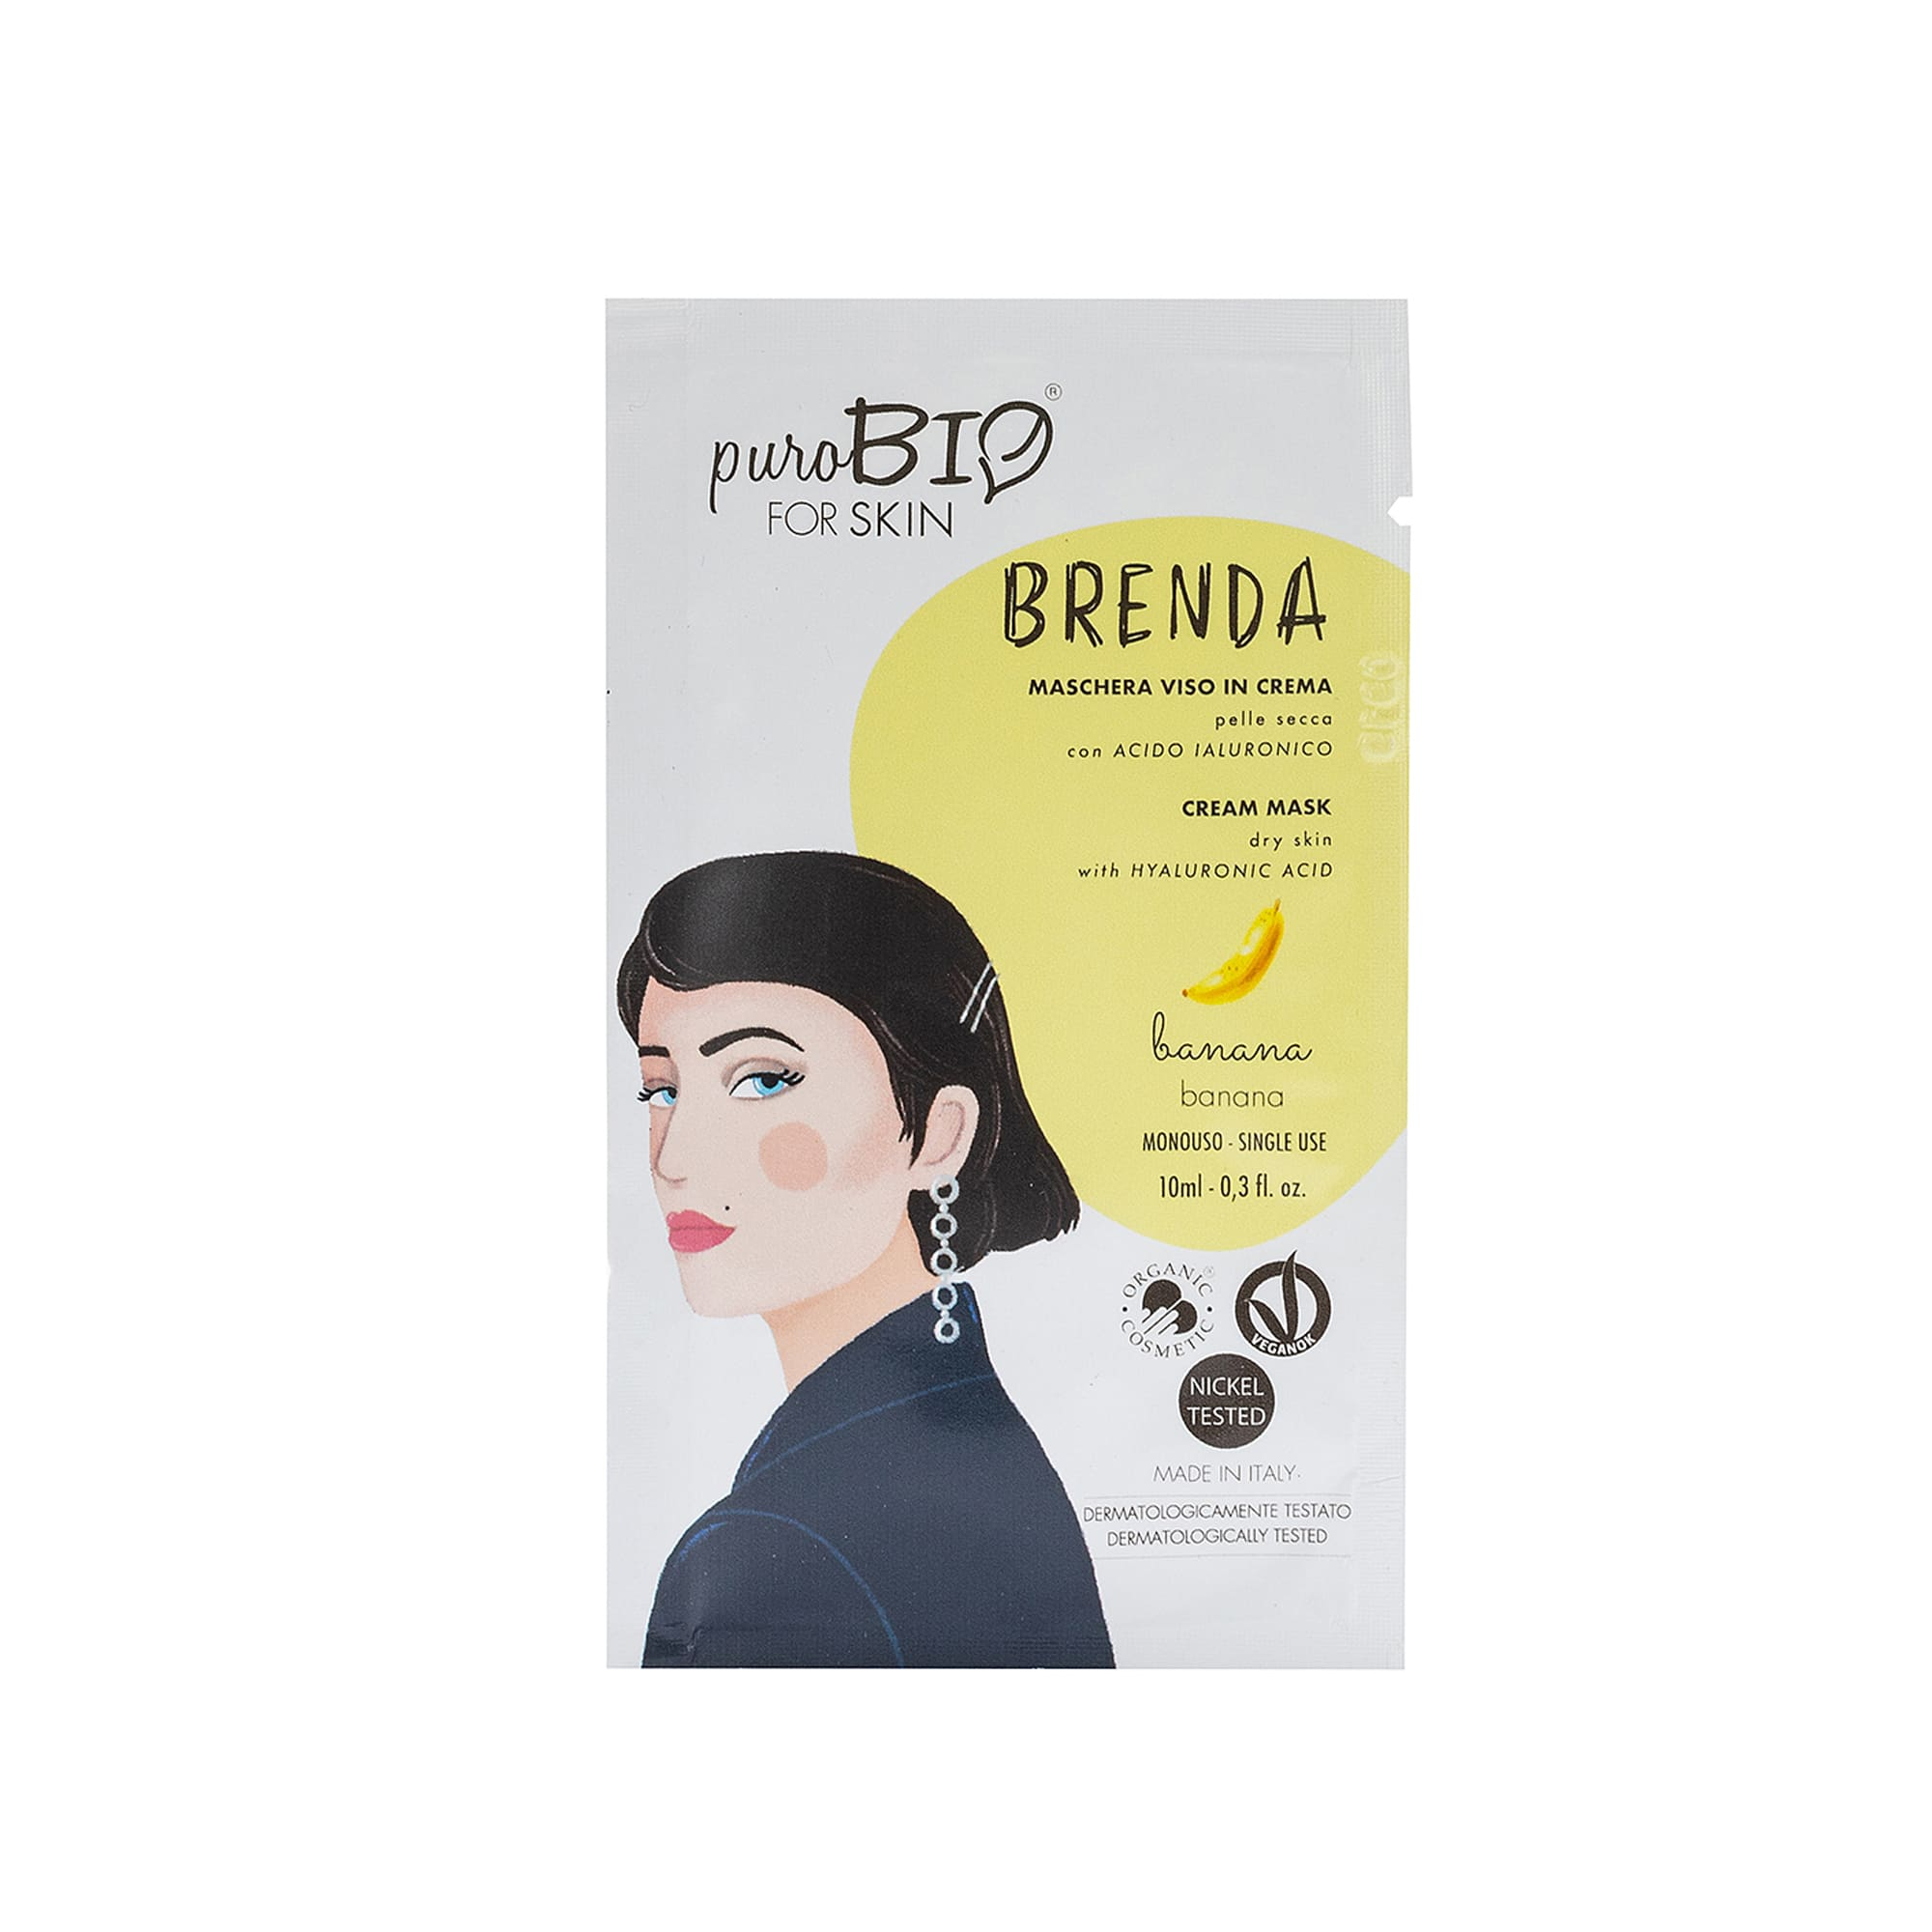 Brenda-banane-min